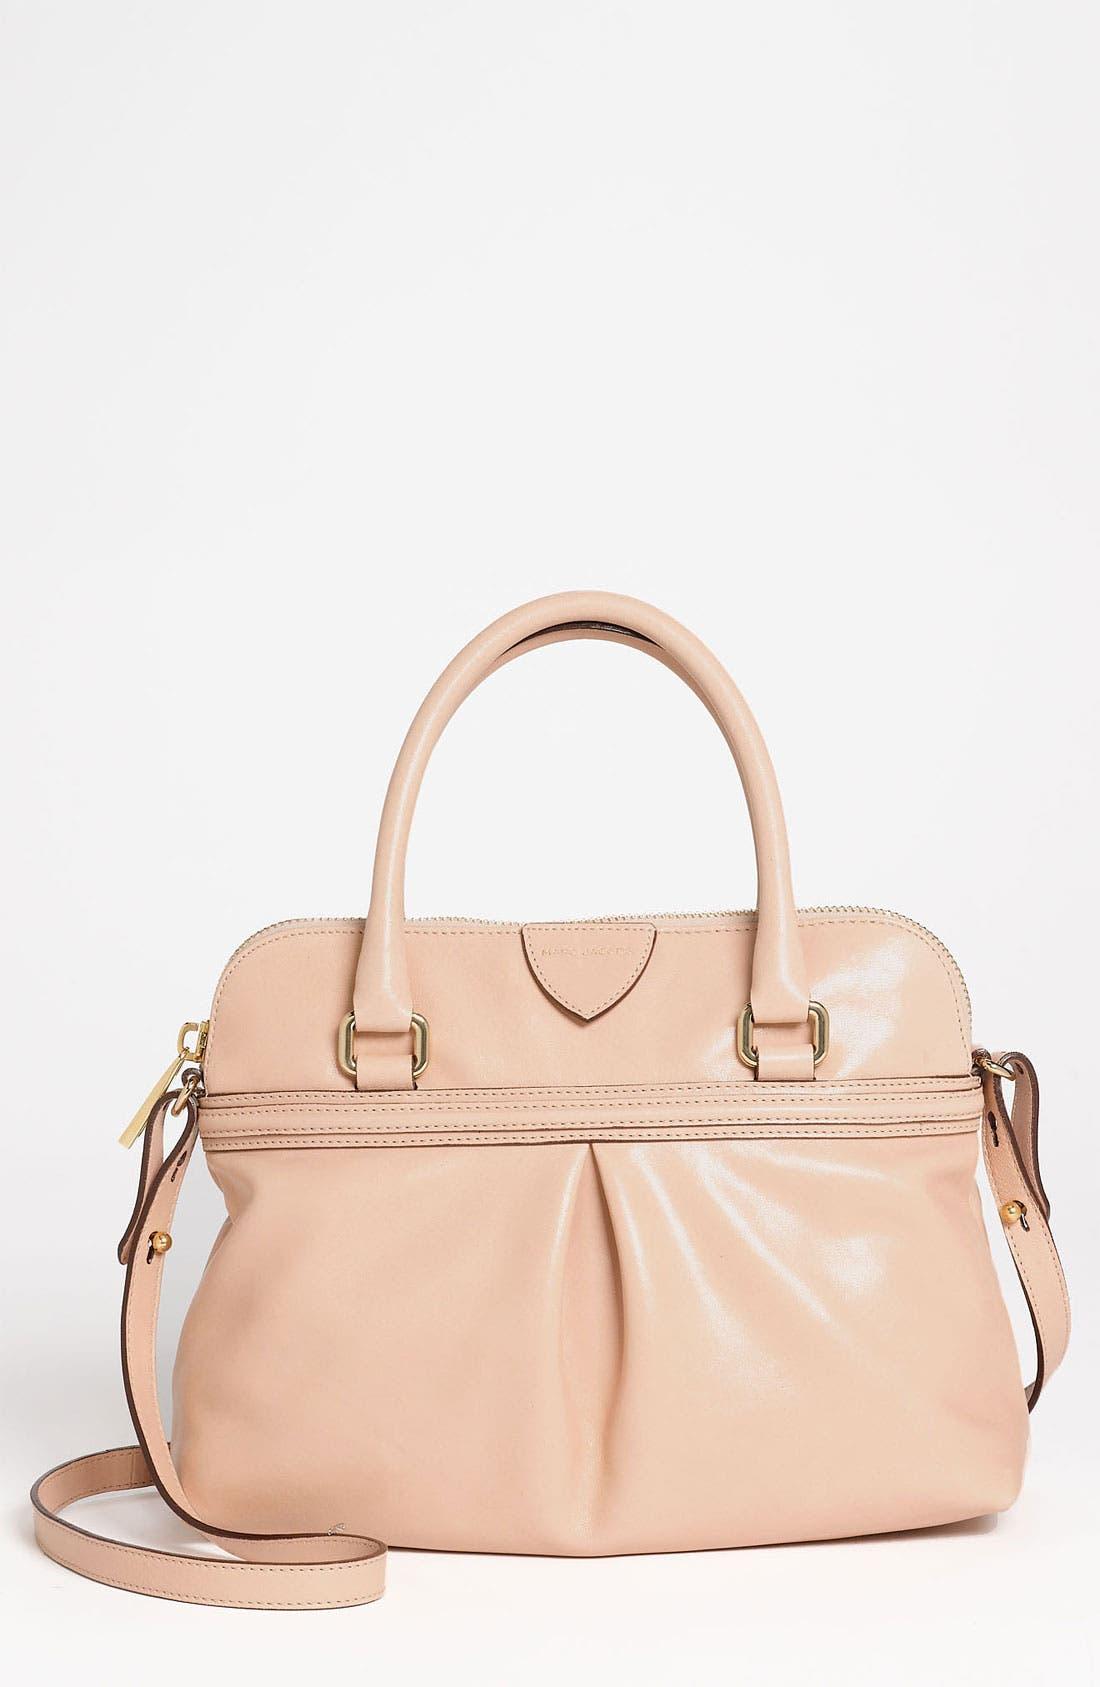 Main Image - MARC JACOBS 'Preston' Leather Handbag